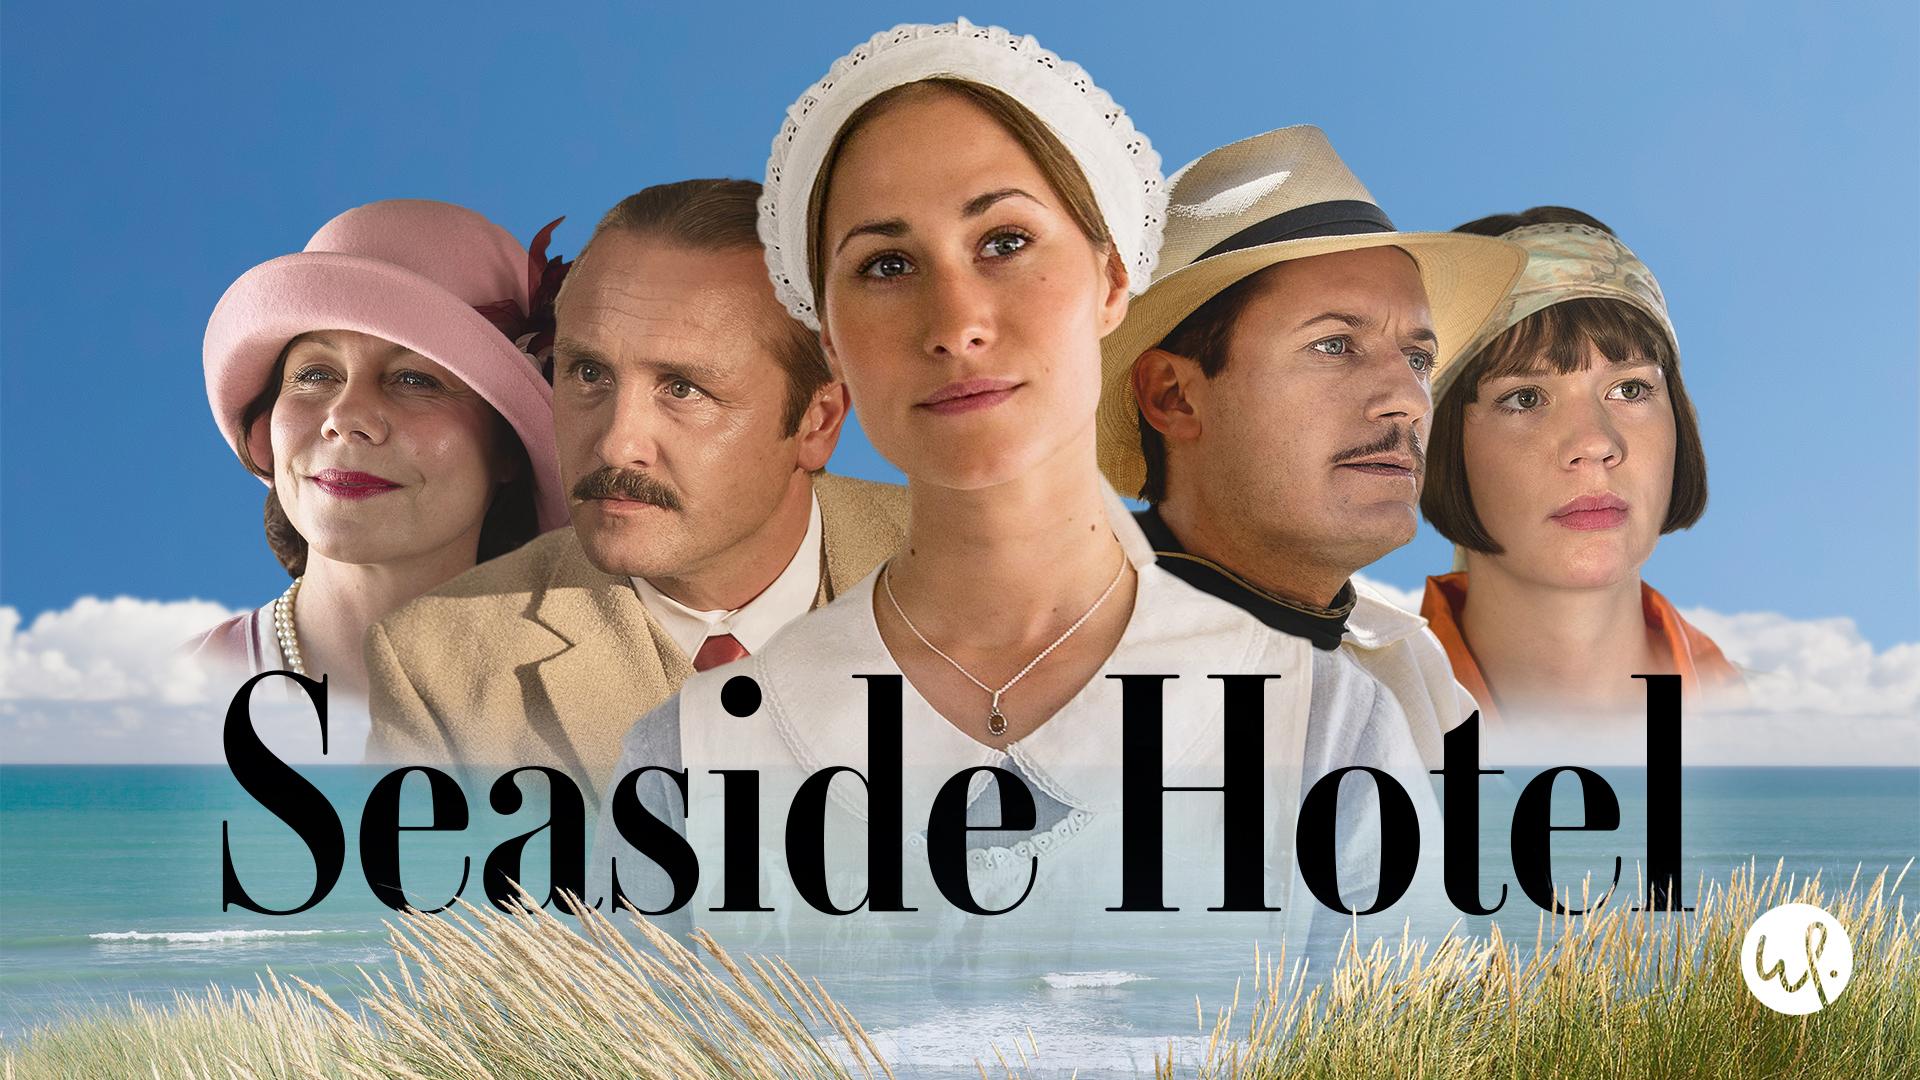 Seaside Hotel: Season 1